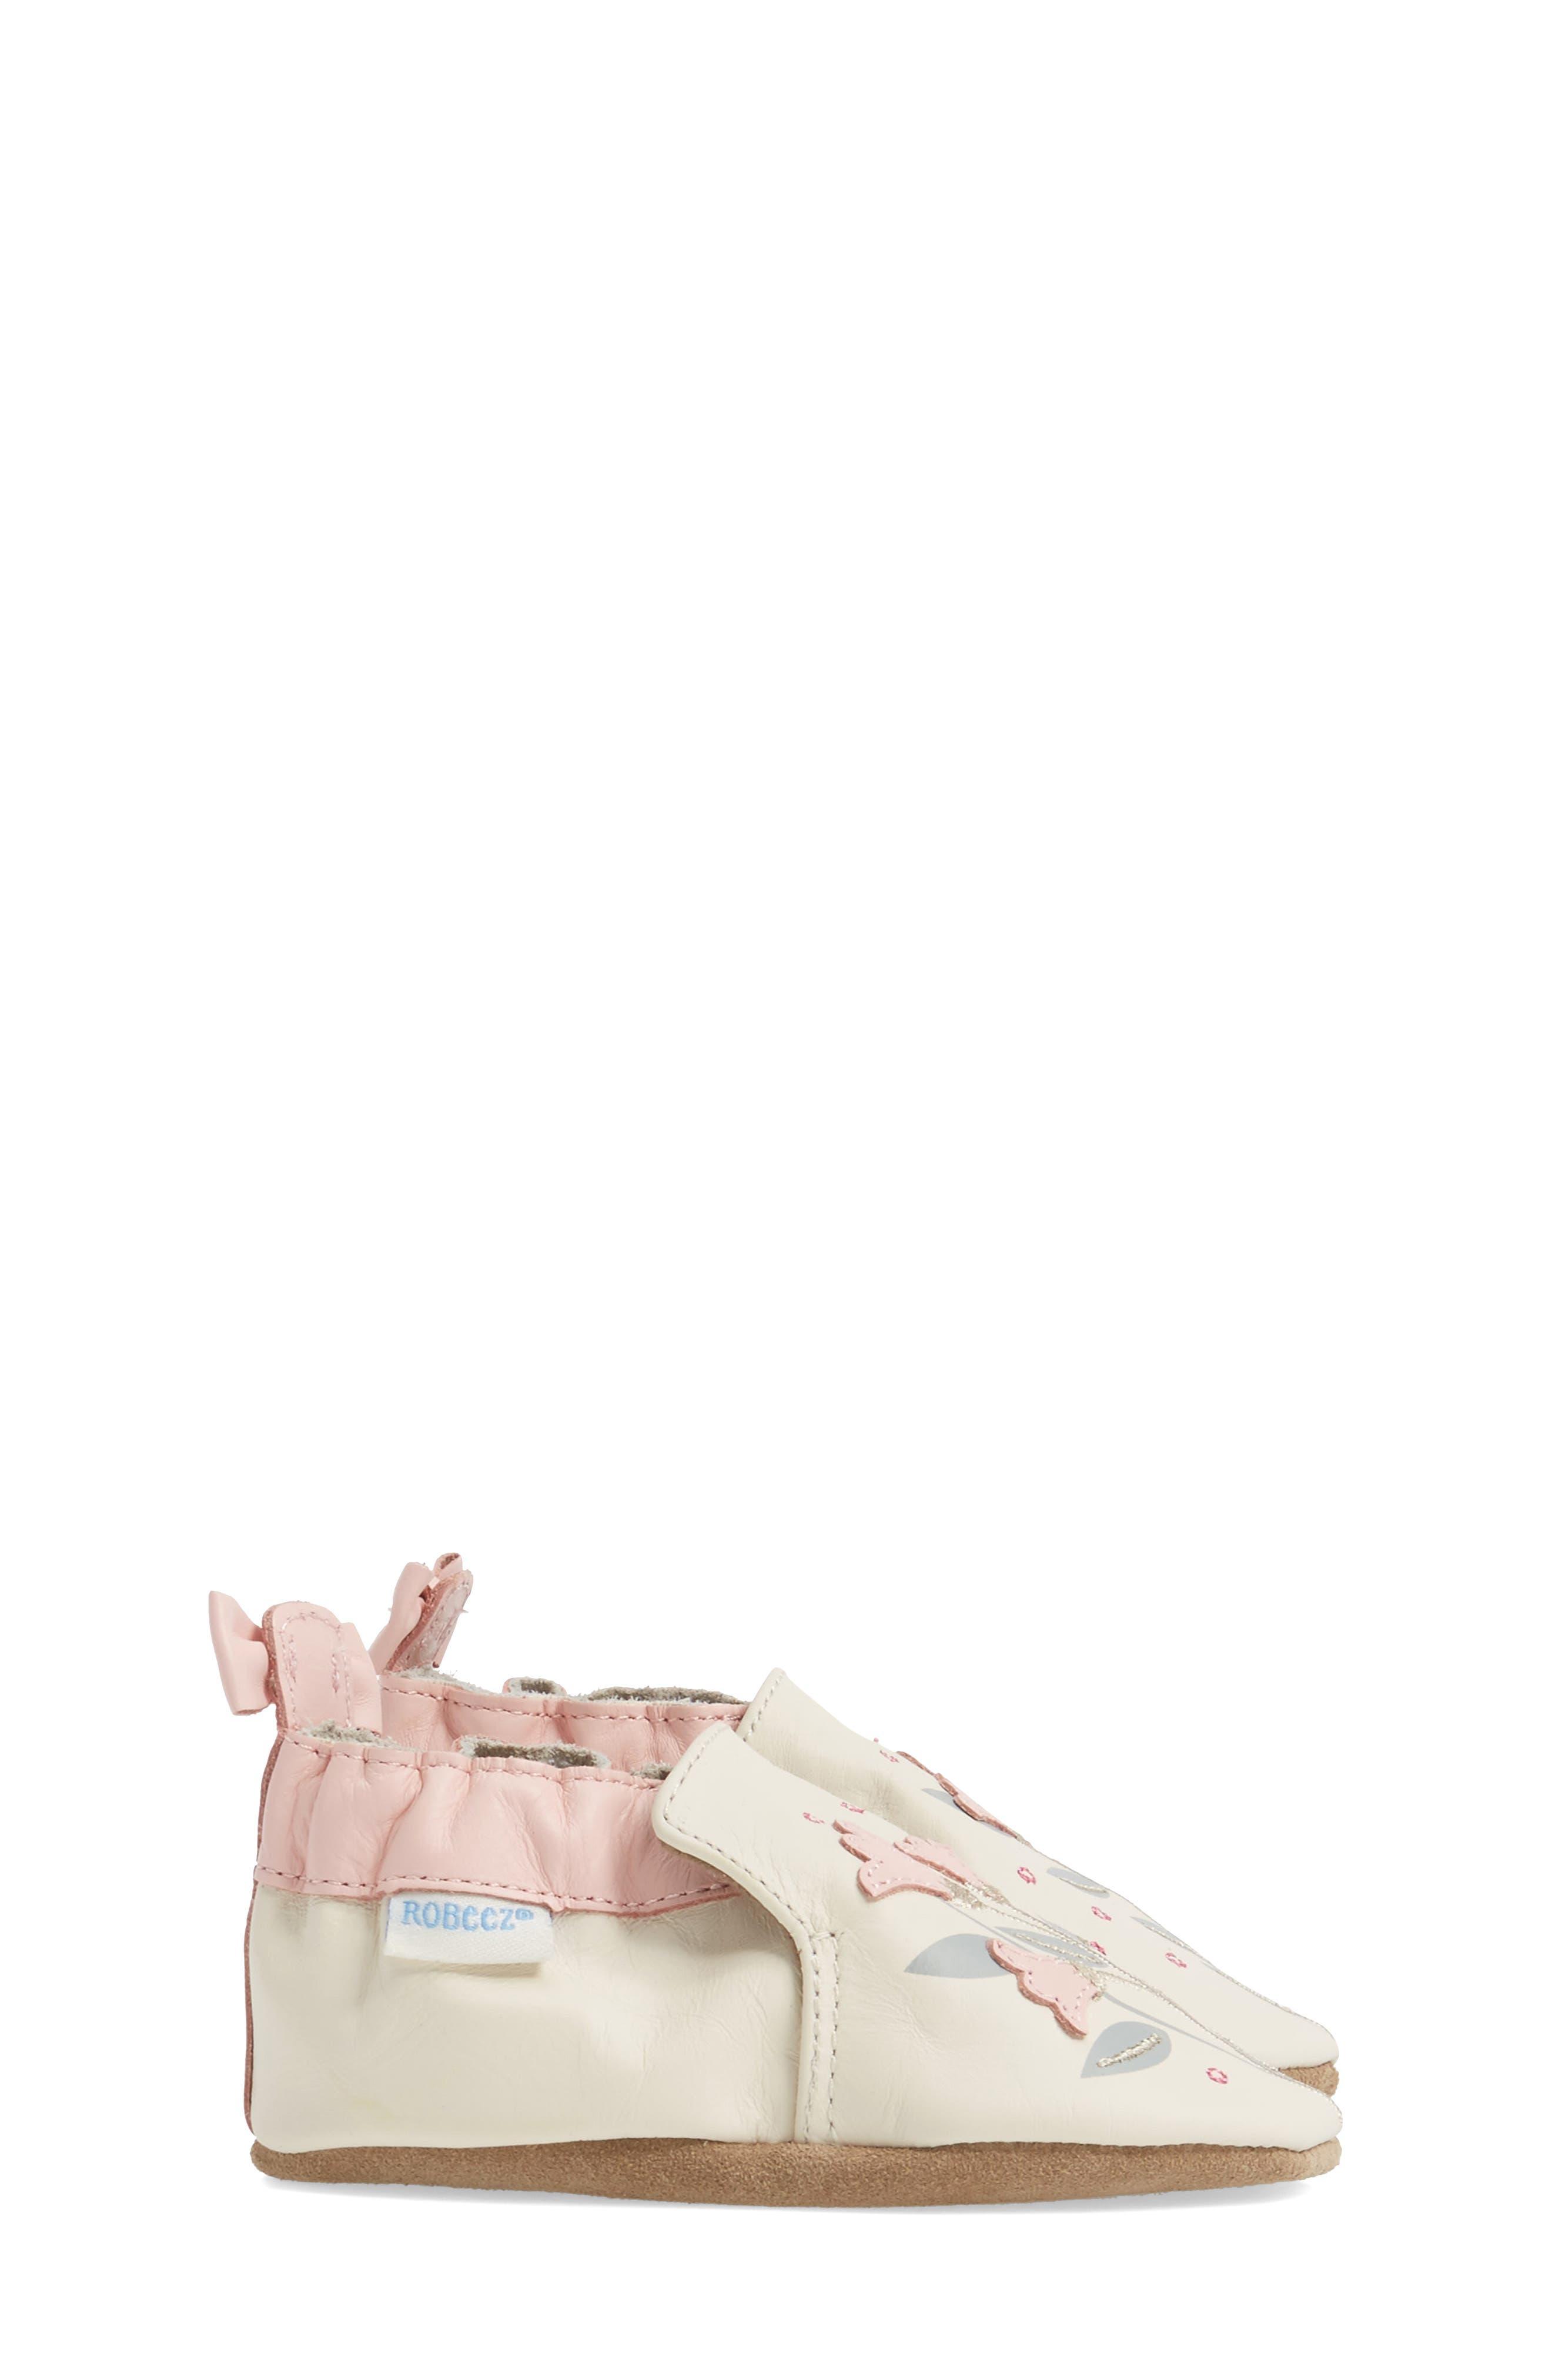 Rosealean Crib Shoe,                             Alternate thumbnail 3, color,                             650